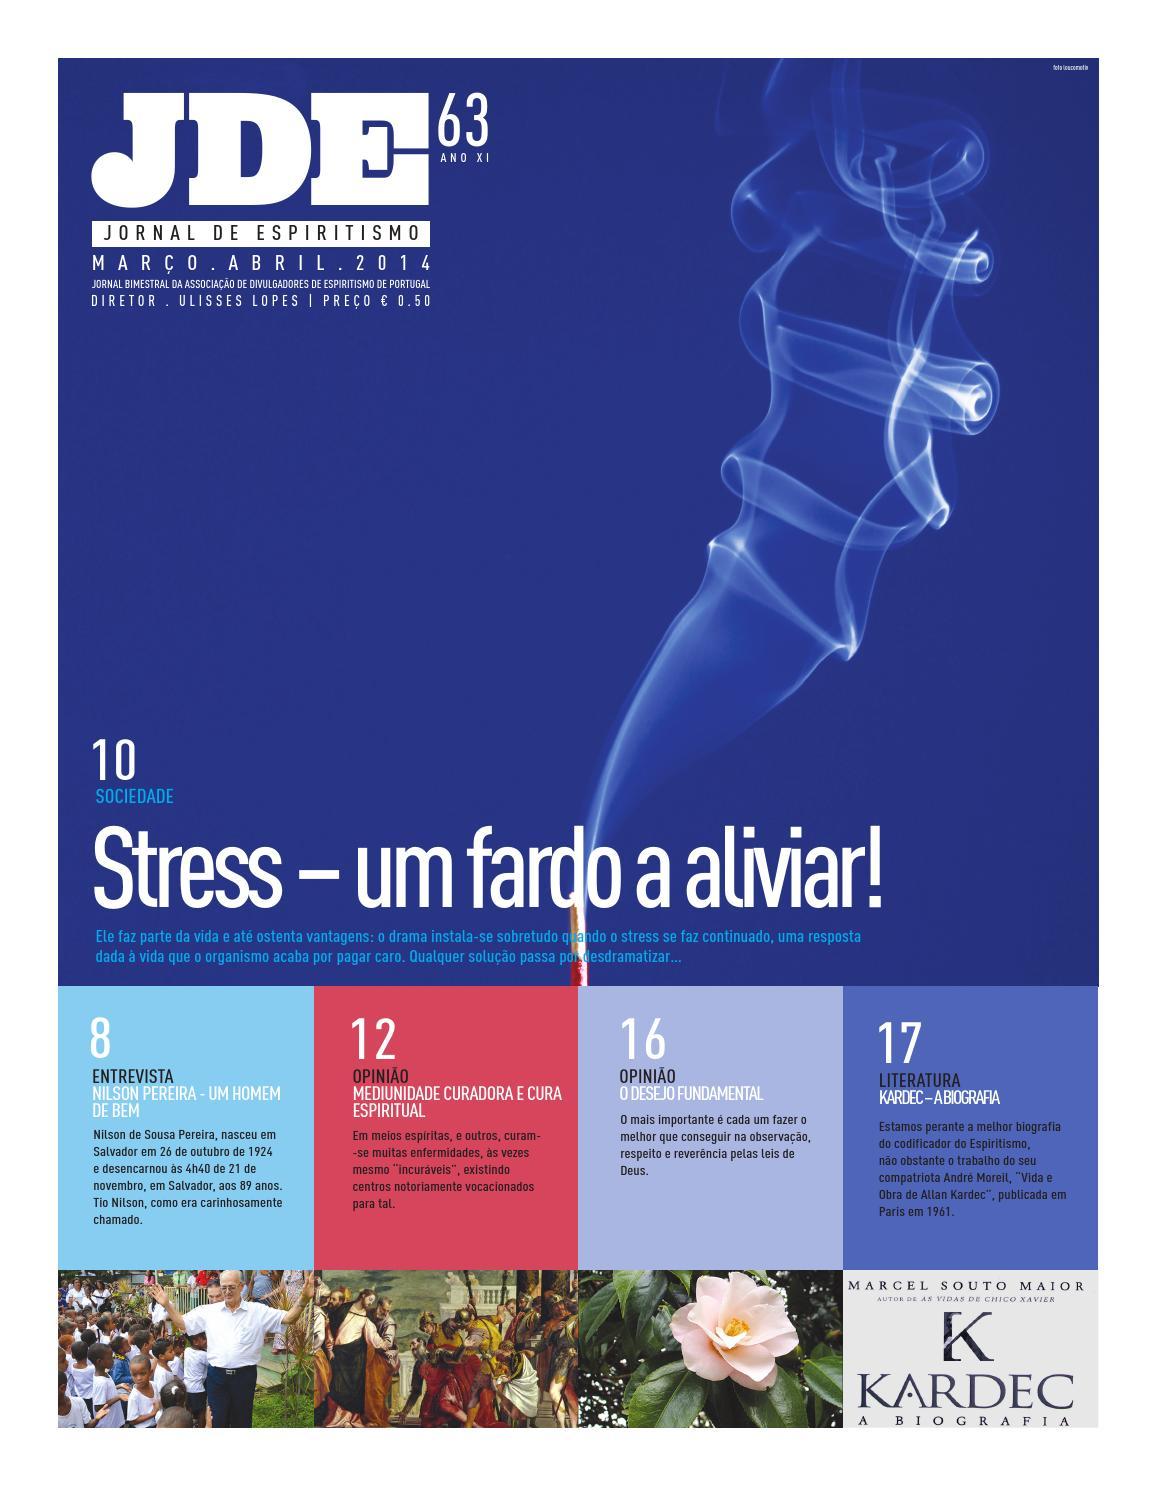 Jde63 by adep portugal - issuu 3176578cdcd